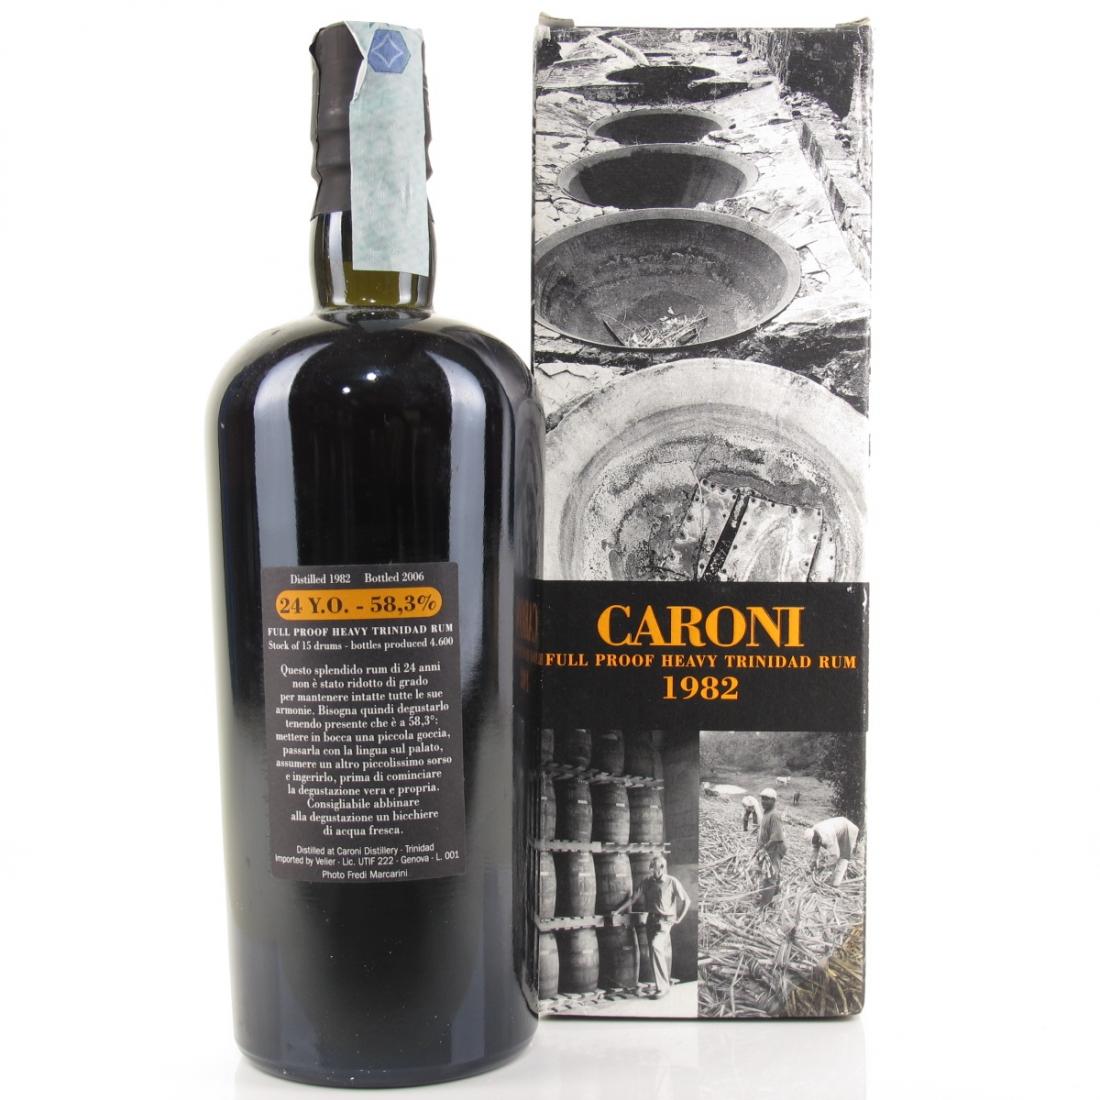 Caroni 1982 Full Proof 24 Year Old Trinidad Rum